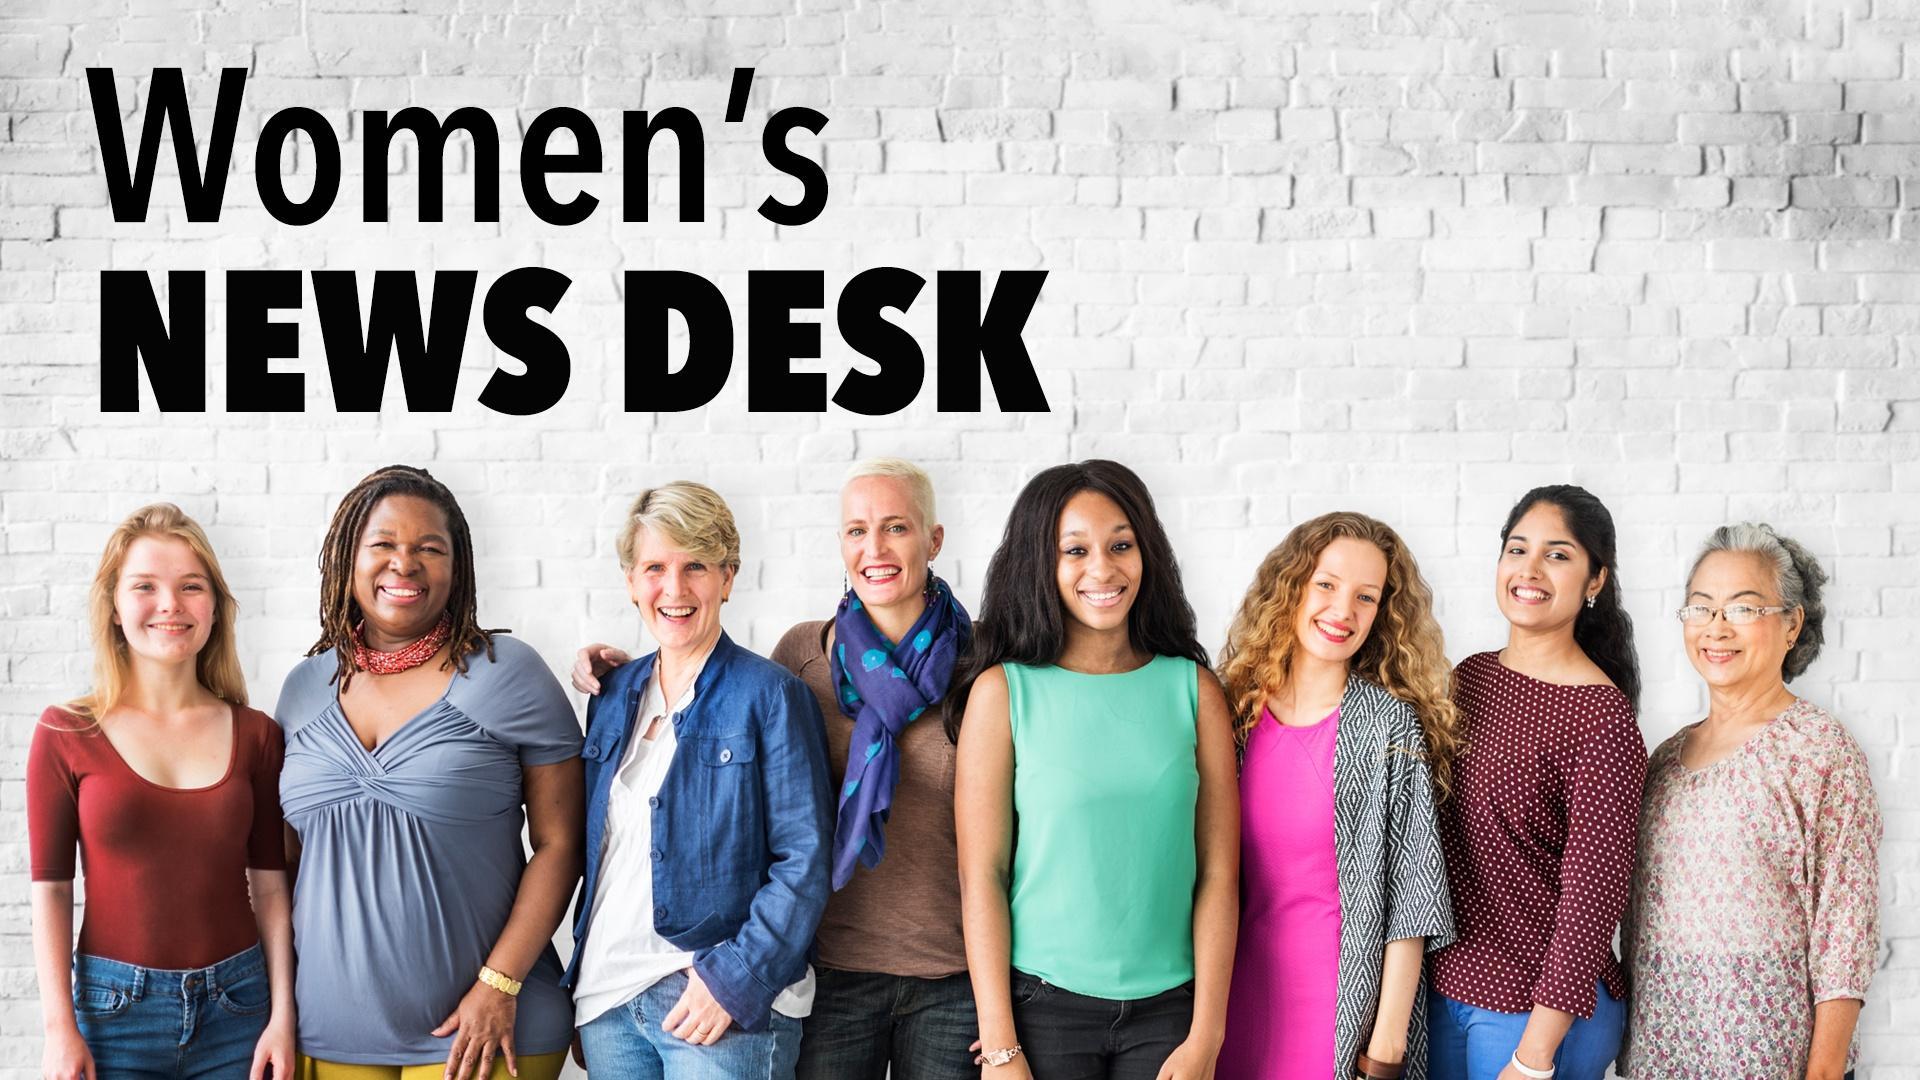 Women's News Desk